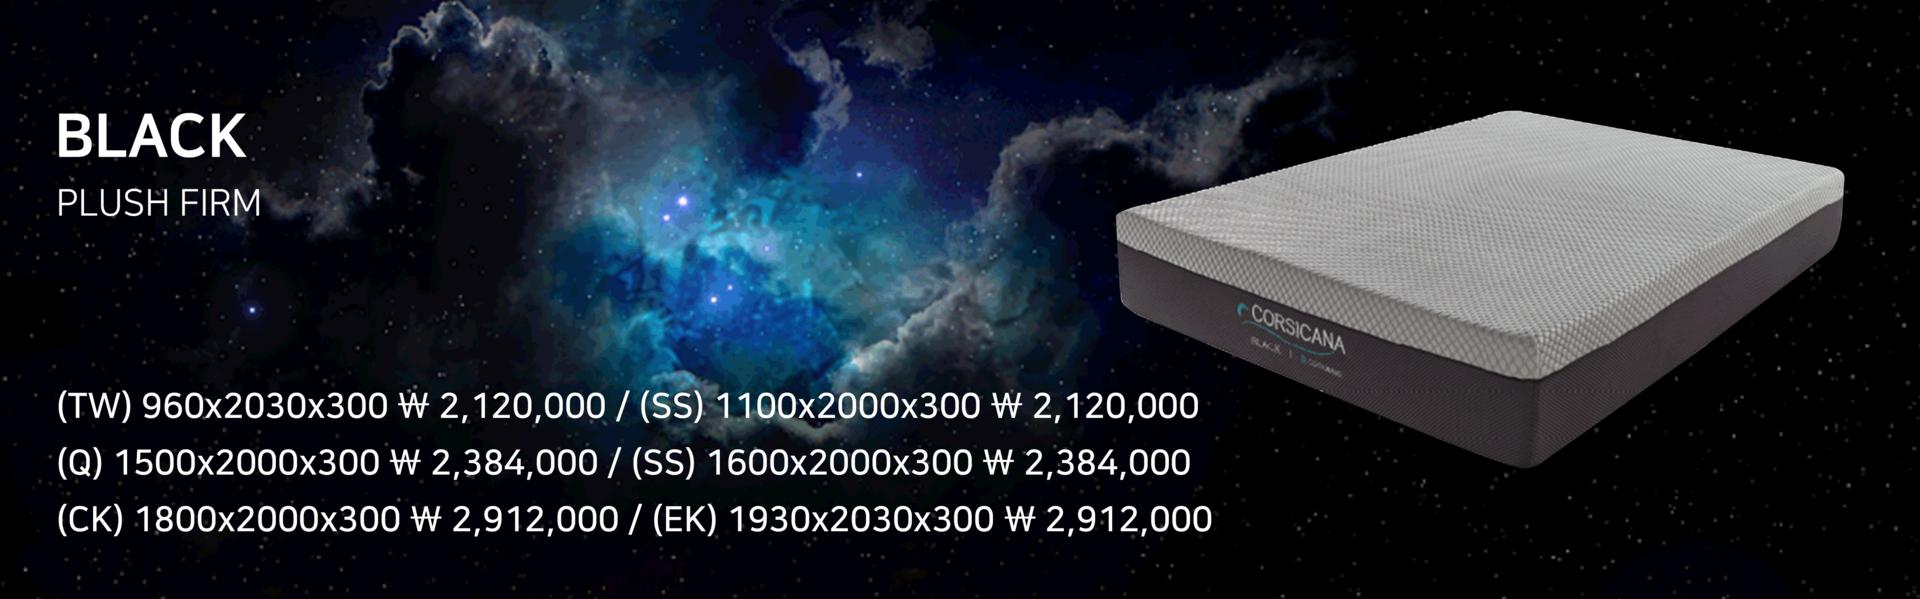 "<font size=""3px""><b>BLACK<b></font><BR><FONT SIZE=""1PX"">PLUSH FIRM</FONT> <BR><br><font size=""0.5px""> (TW) 960x2030x300 ₩2,120,000  /  (SS) 1100x2000x300 ₩2,120,000 <br> (Q) 1500x2000x300 ₩2,384,000  /  (K) 1600x2000x300 ₩2,648,000    <br>(CK) 1800x2000x300 ₩2,912,000  /  (EK) 1930x2030x300 ₩2,912,000</font>"